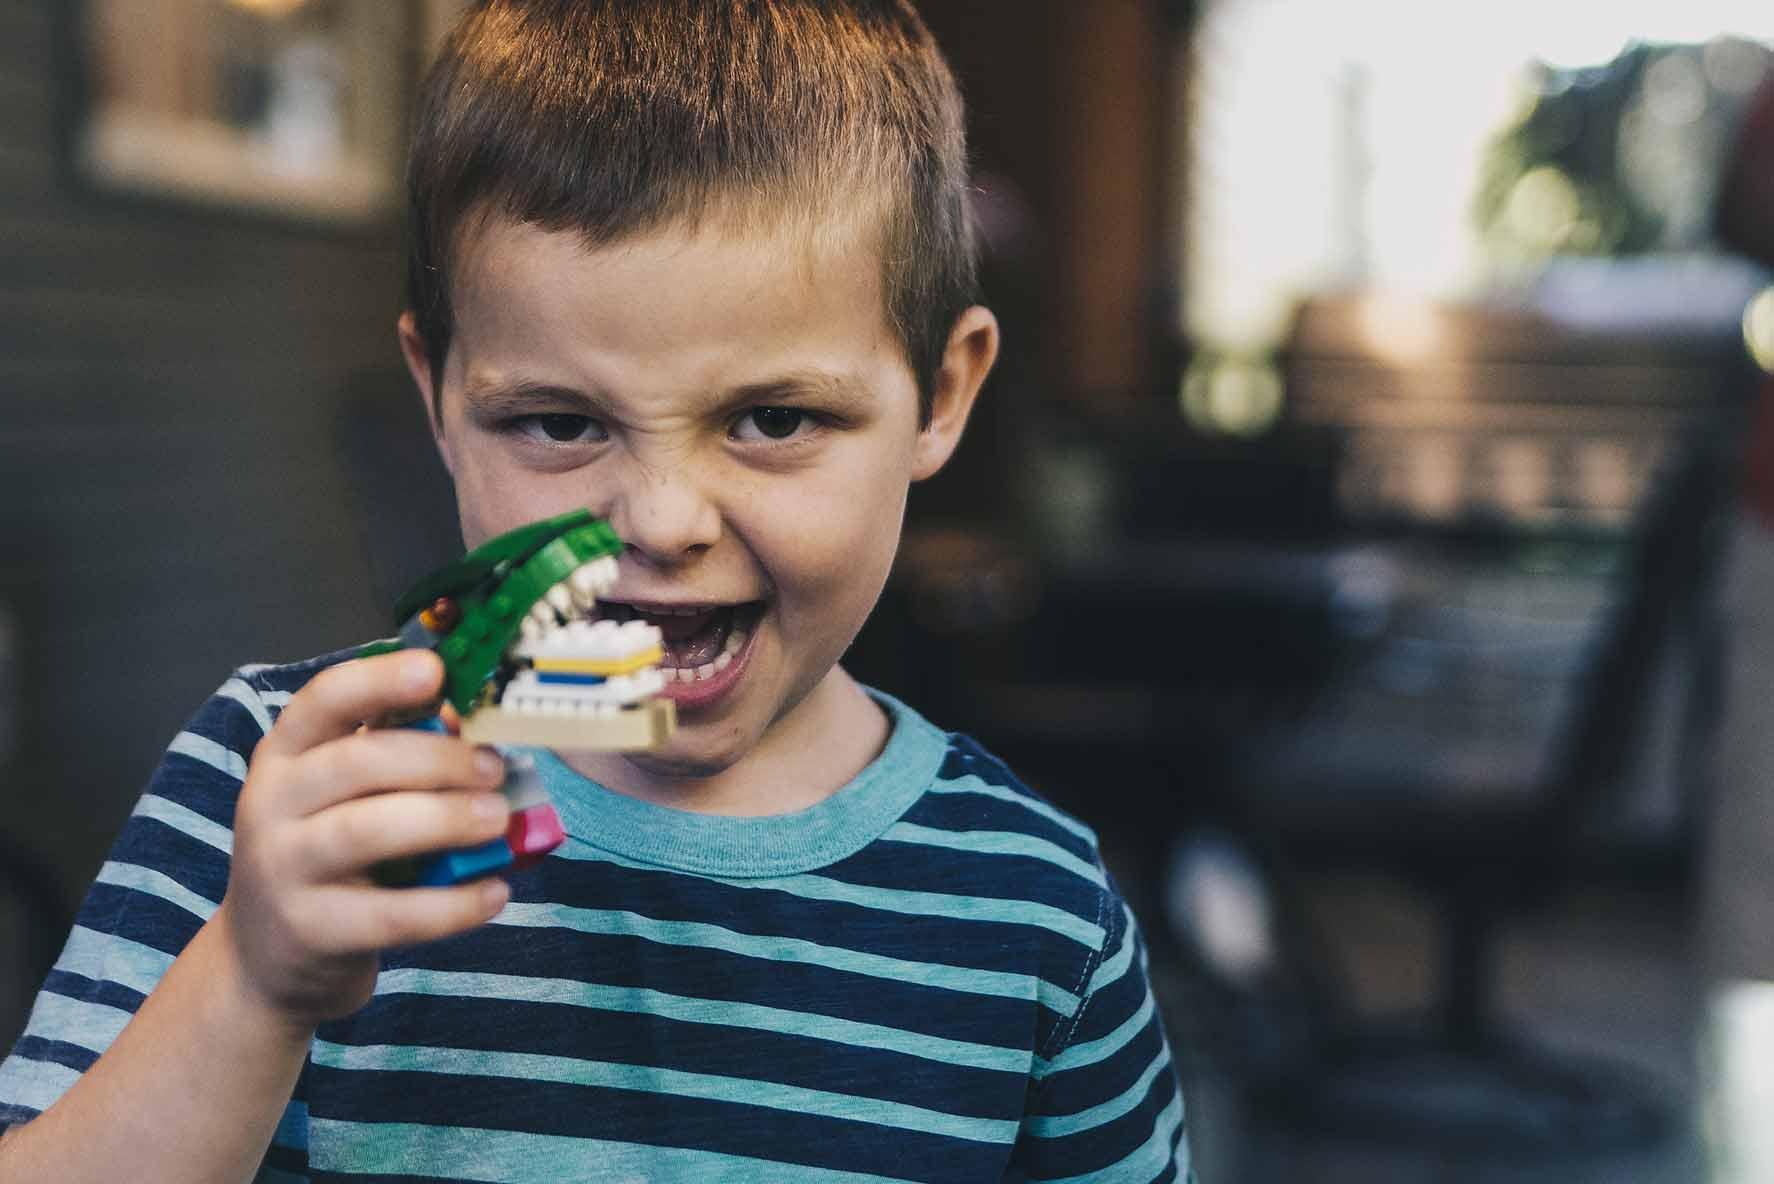 Kirkland Dentist | Kirkland Cornerstone Dental | Ben Choi | Selina An | Bruxism | Teeth Grinding